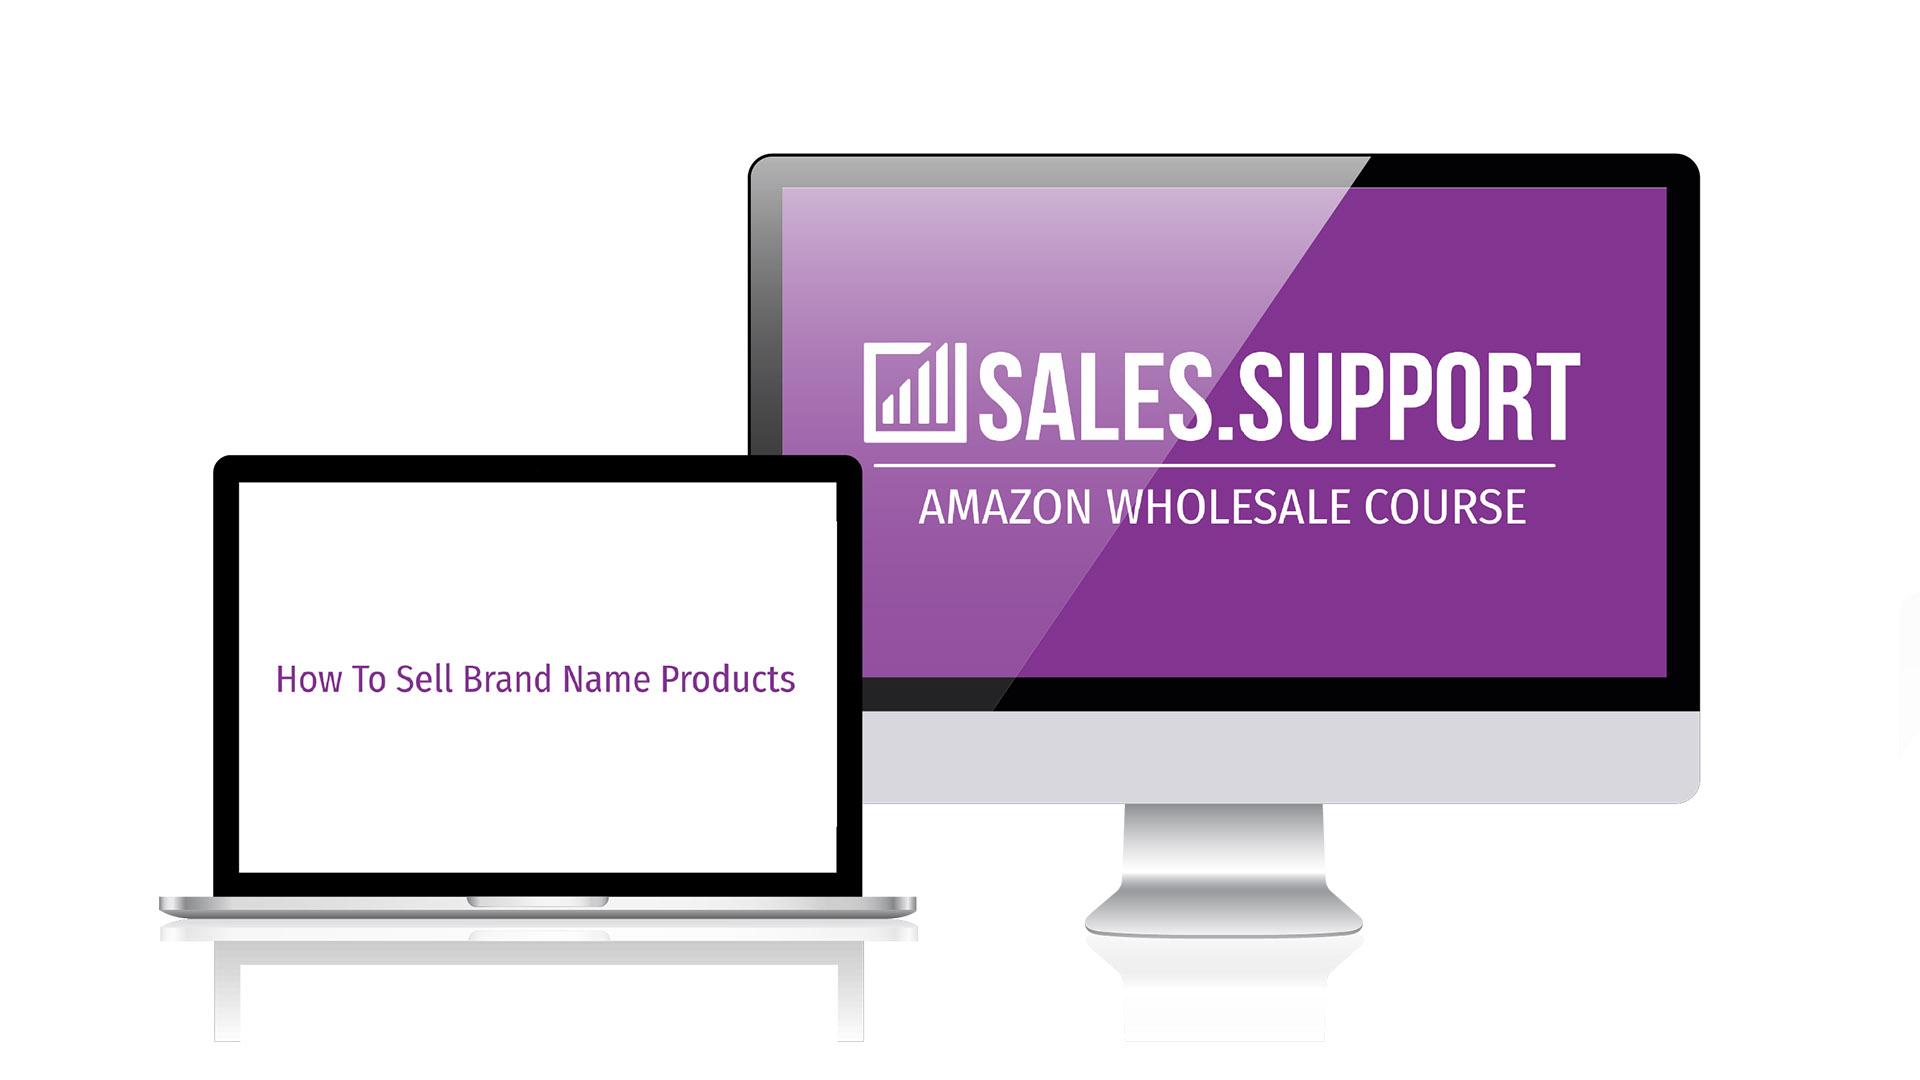 Amazon Wholesale Course 2020